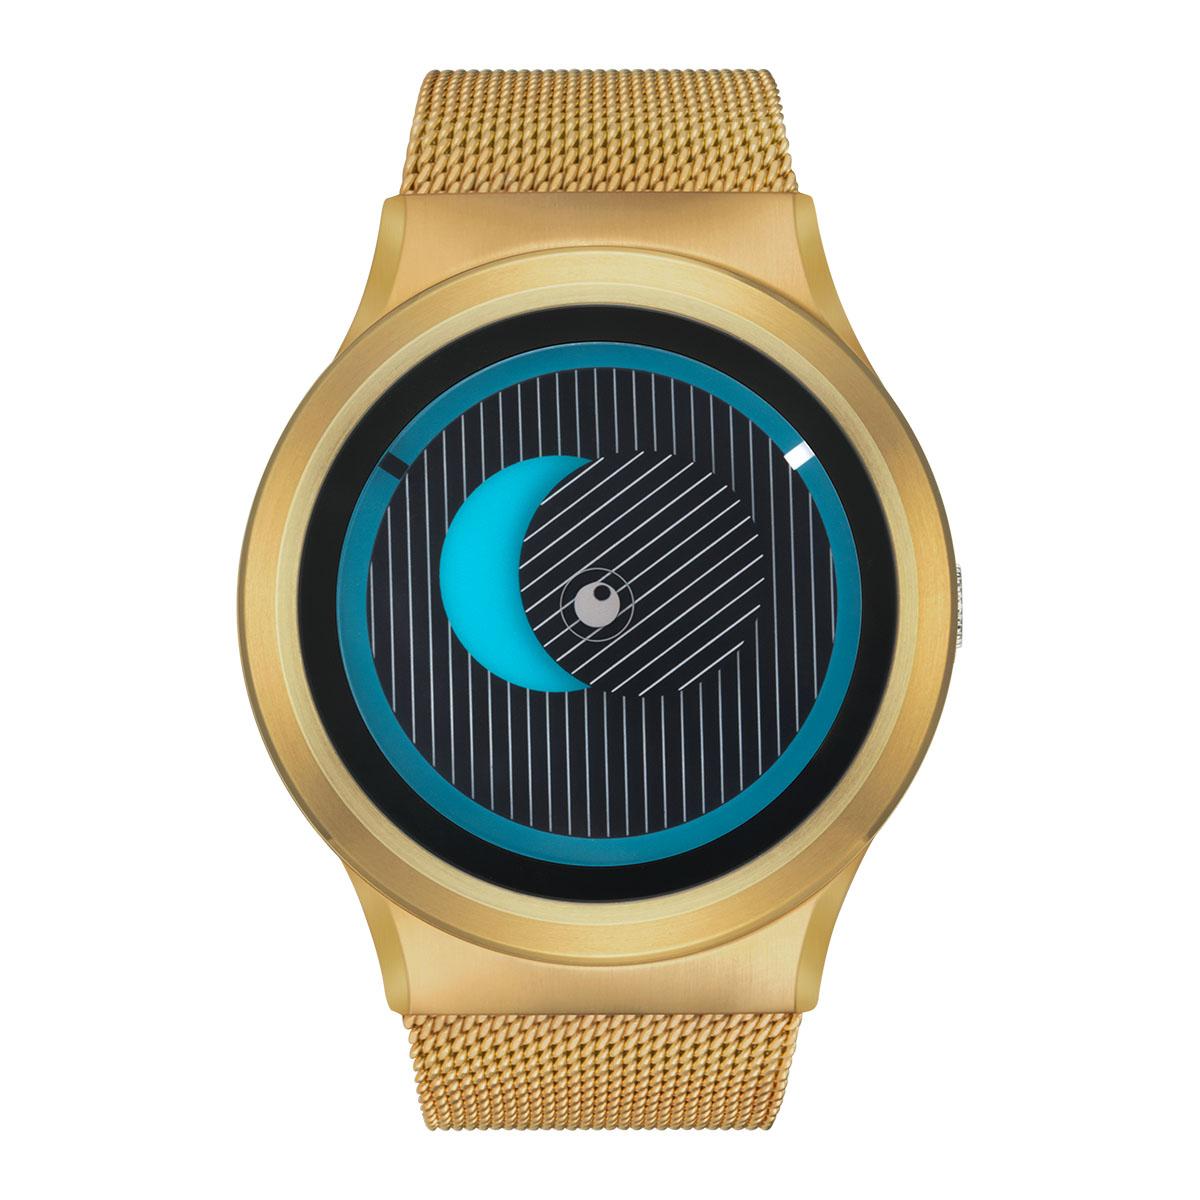 ZEROO SECRET UNIVERSE ゼロ 電池式クォーツ 腕時計 [W05013B04SM04] ブルー